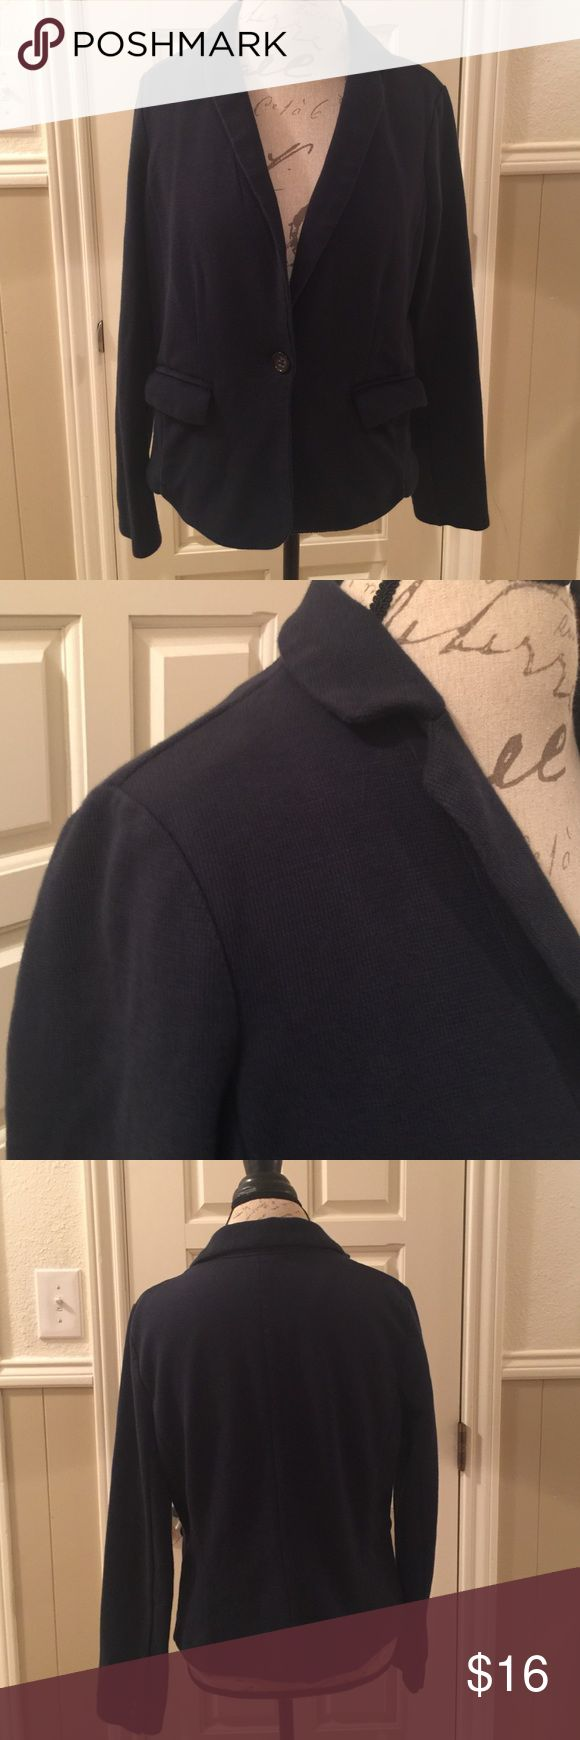 "Banana Republic Knit Blazer Sz large. Cute navy knit blazer. This will dress up any pair of jeans. 22"" from shoulder to hem. From Banana Republic. Banana Republic Jackets & Coats Blazers"